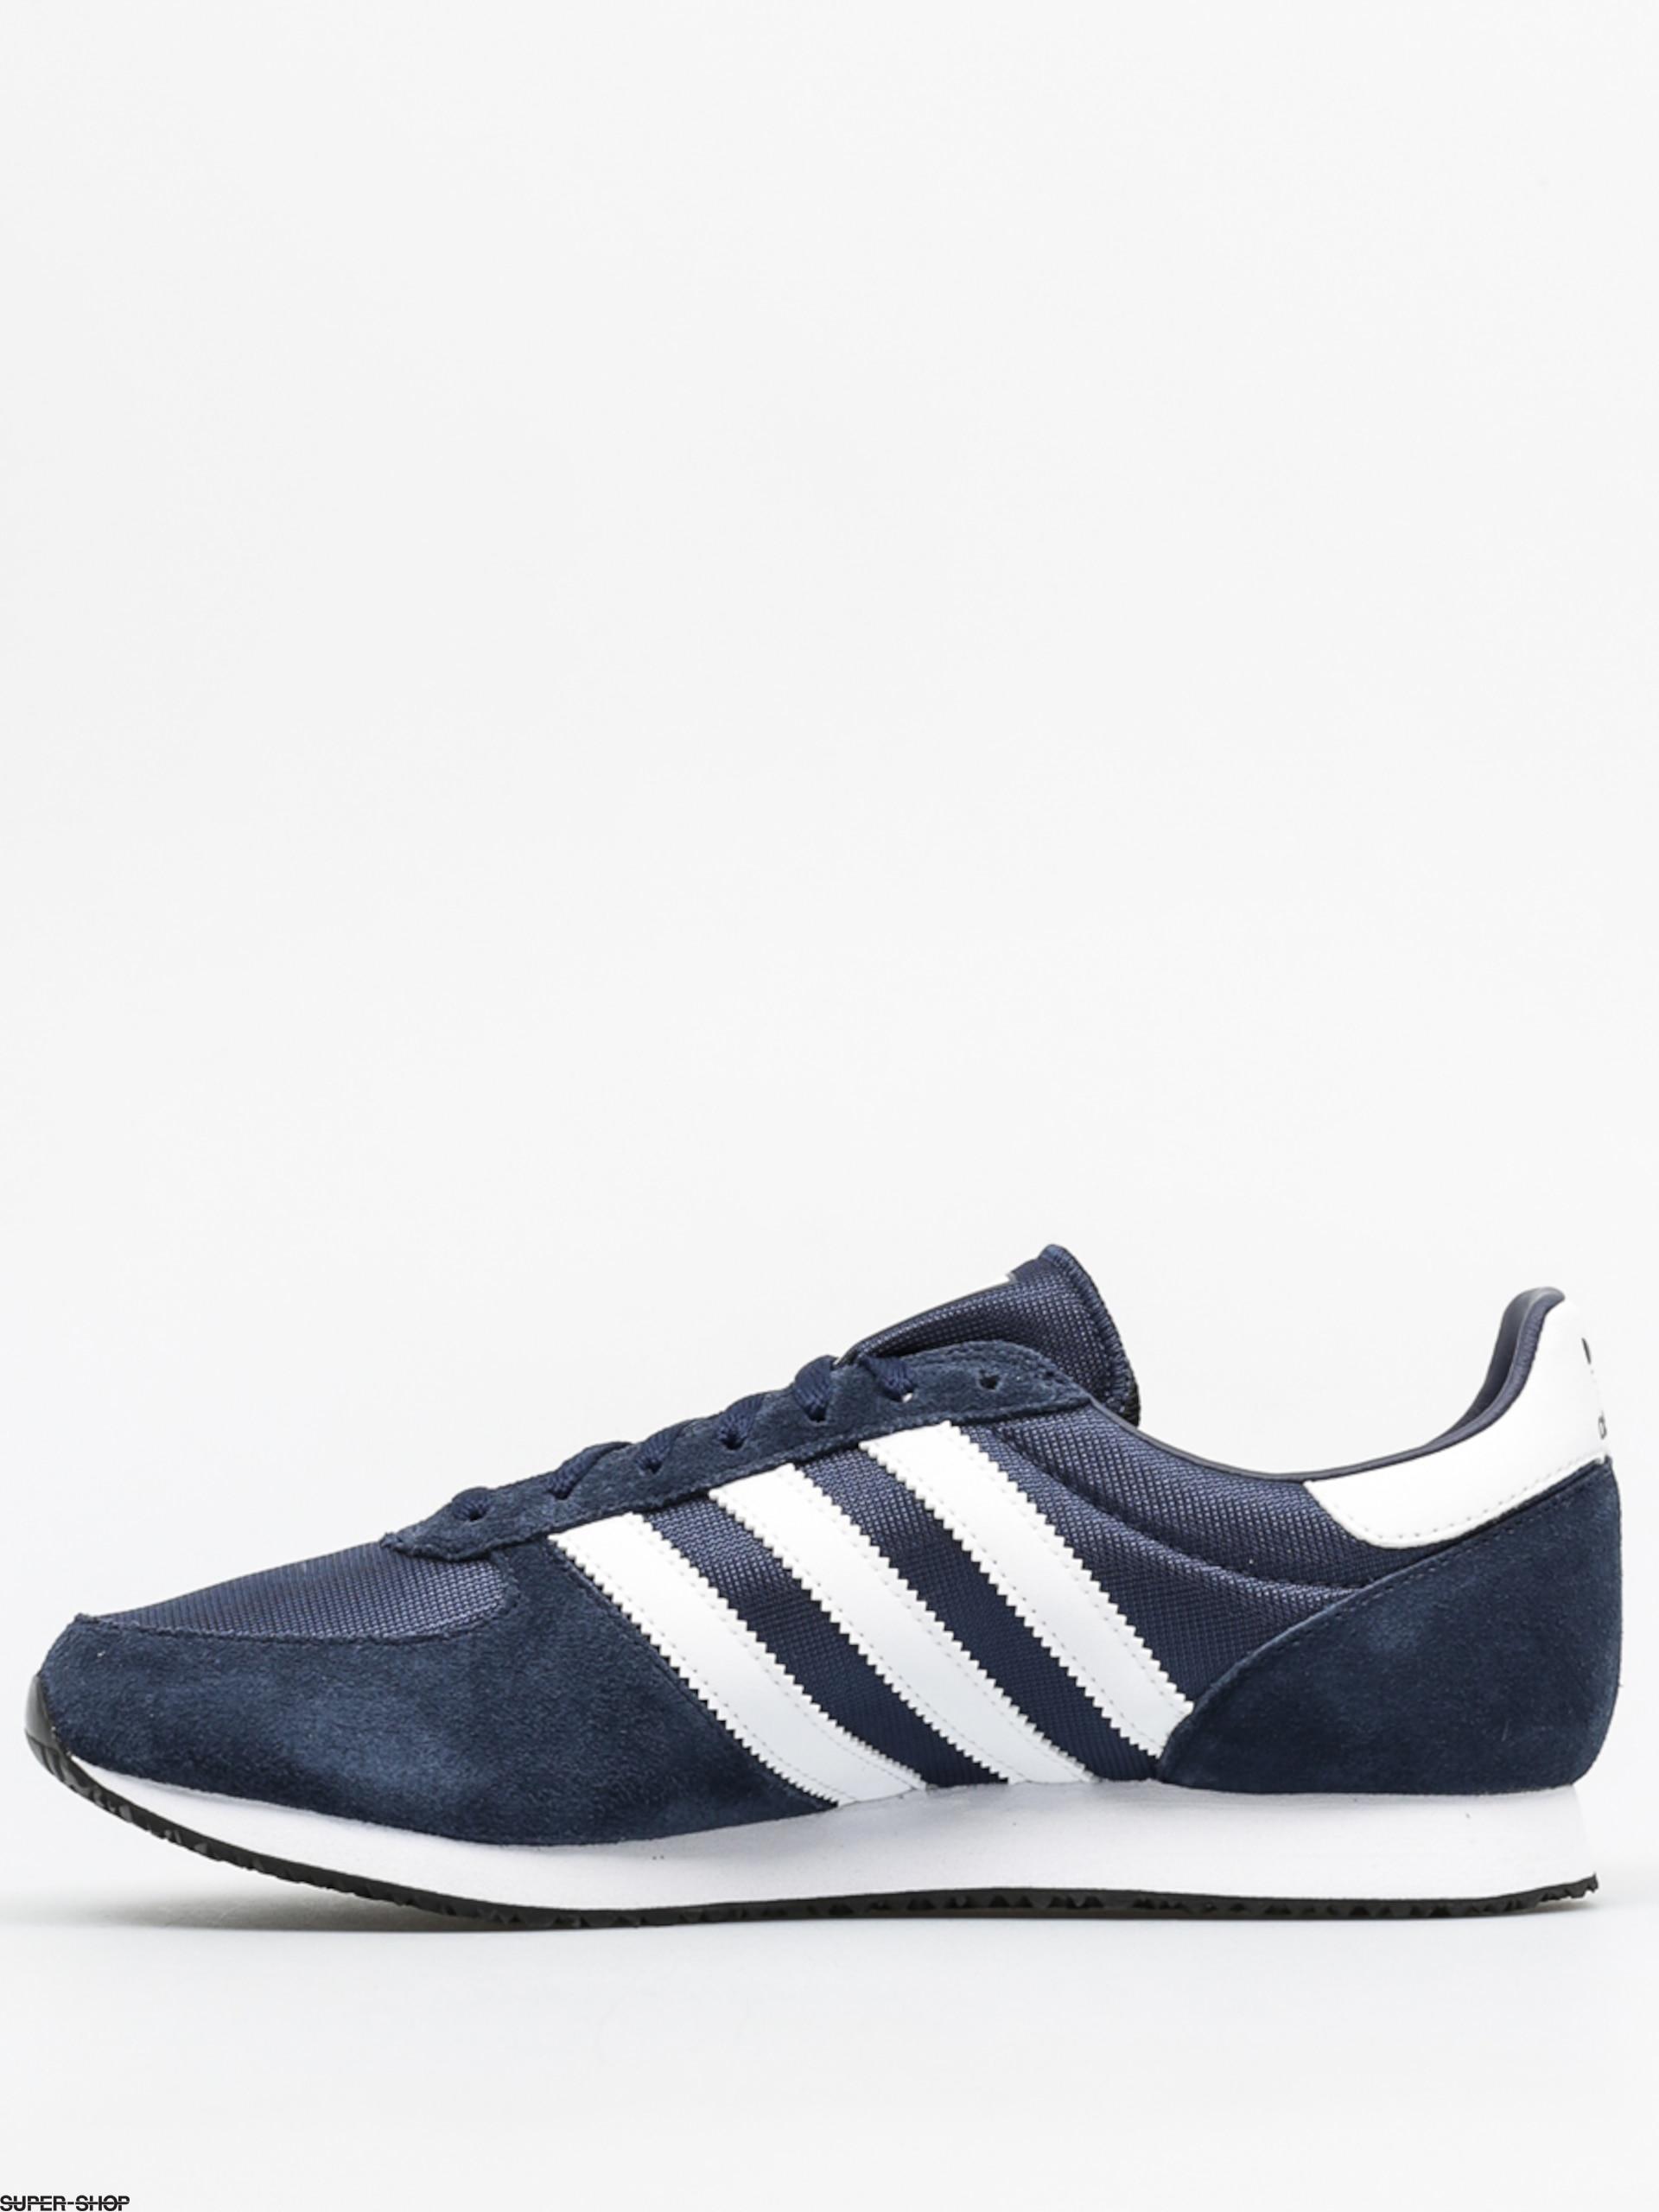 Adidas Shoes Zx Racer Conavy Ftwwht Cblack Blue Black